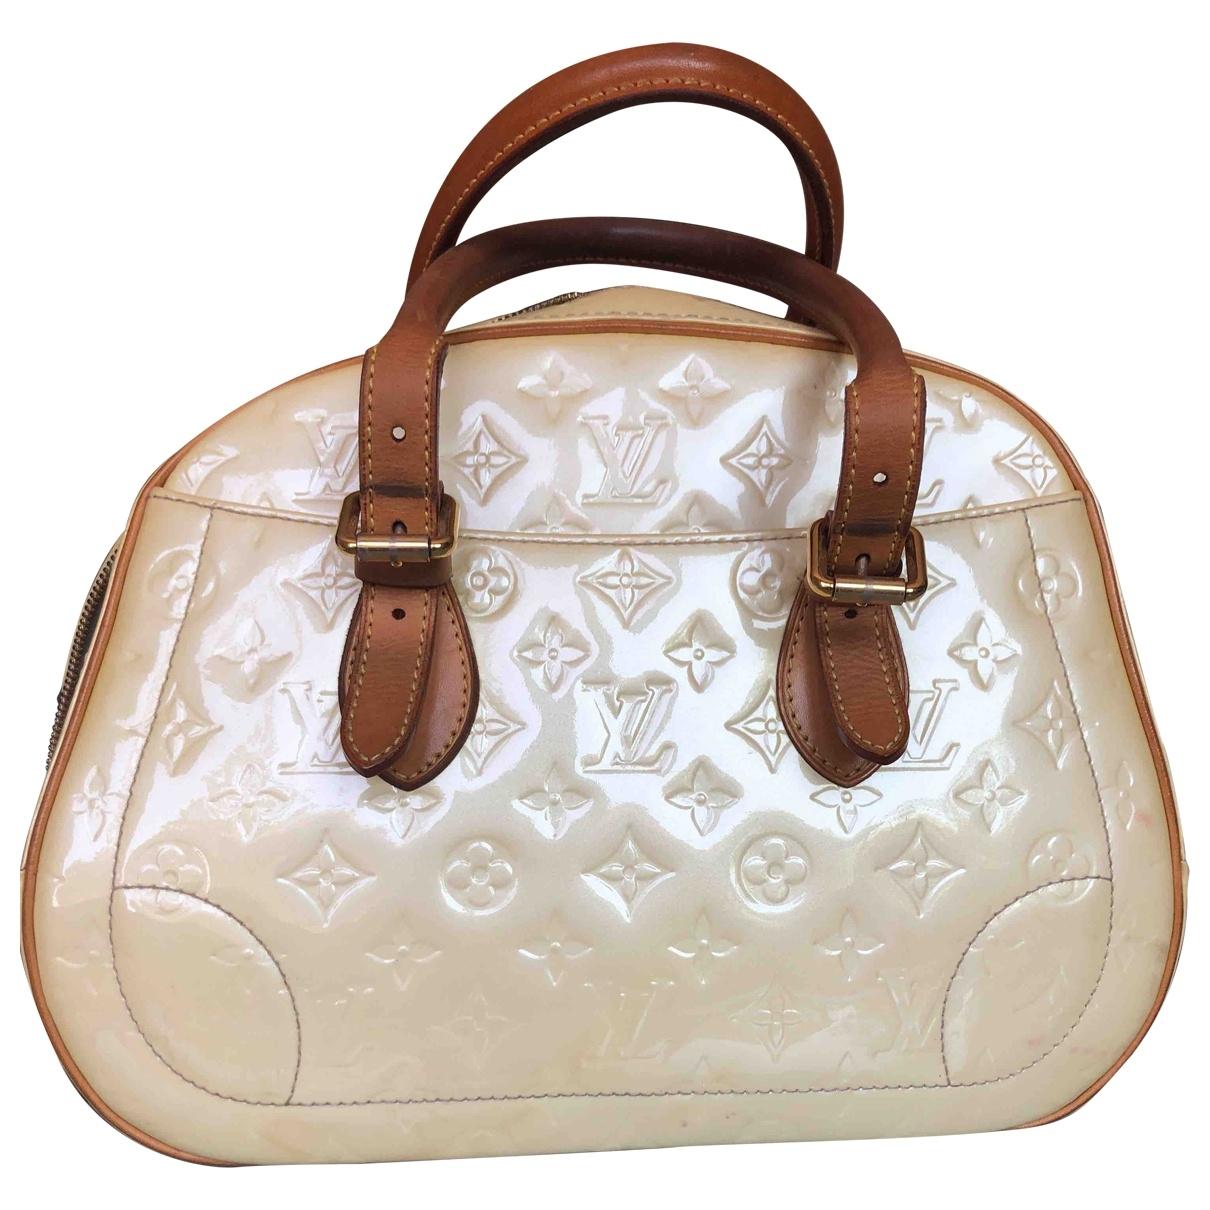 Louis Vuitton \N Ecru Patent leather handbag for Women \N